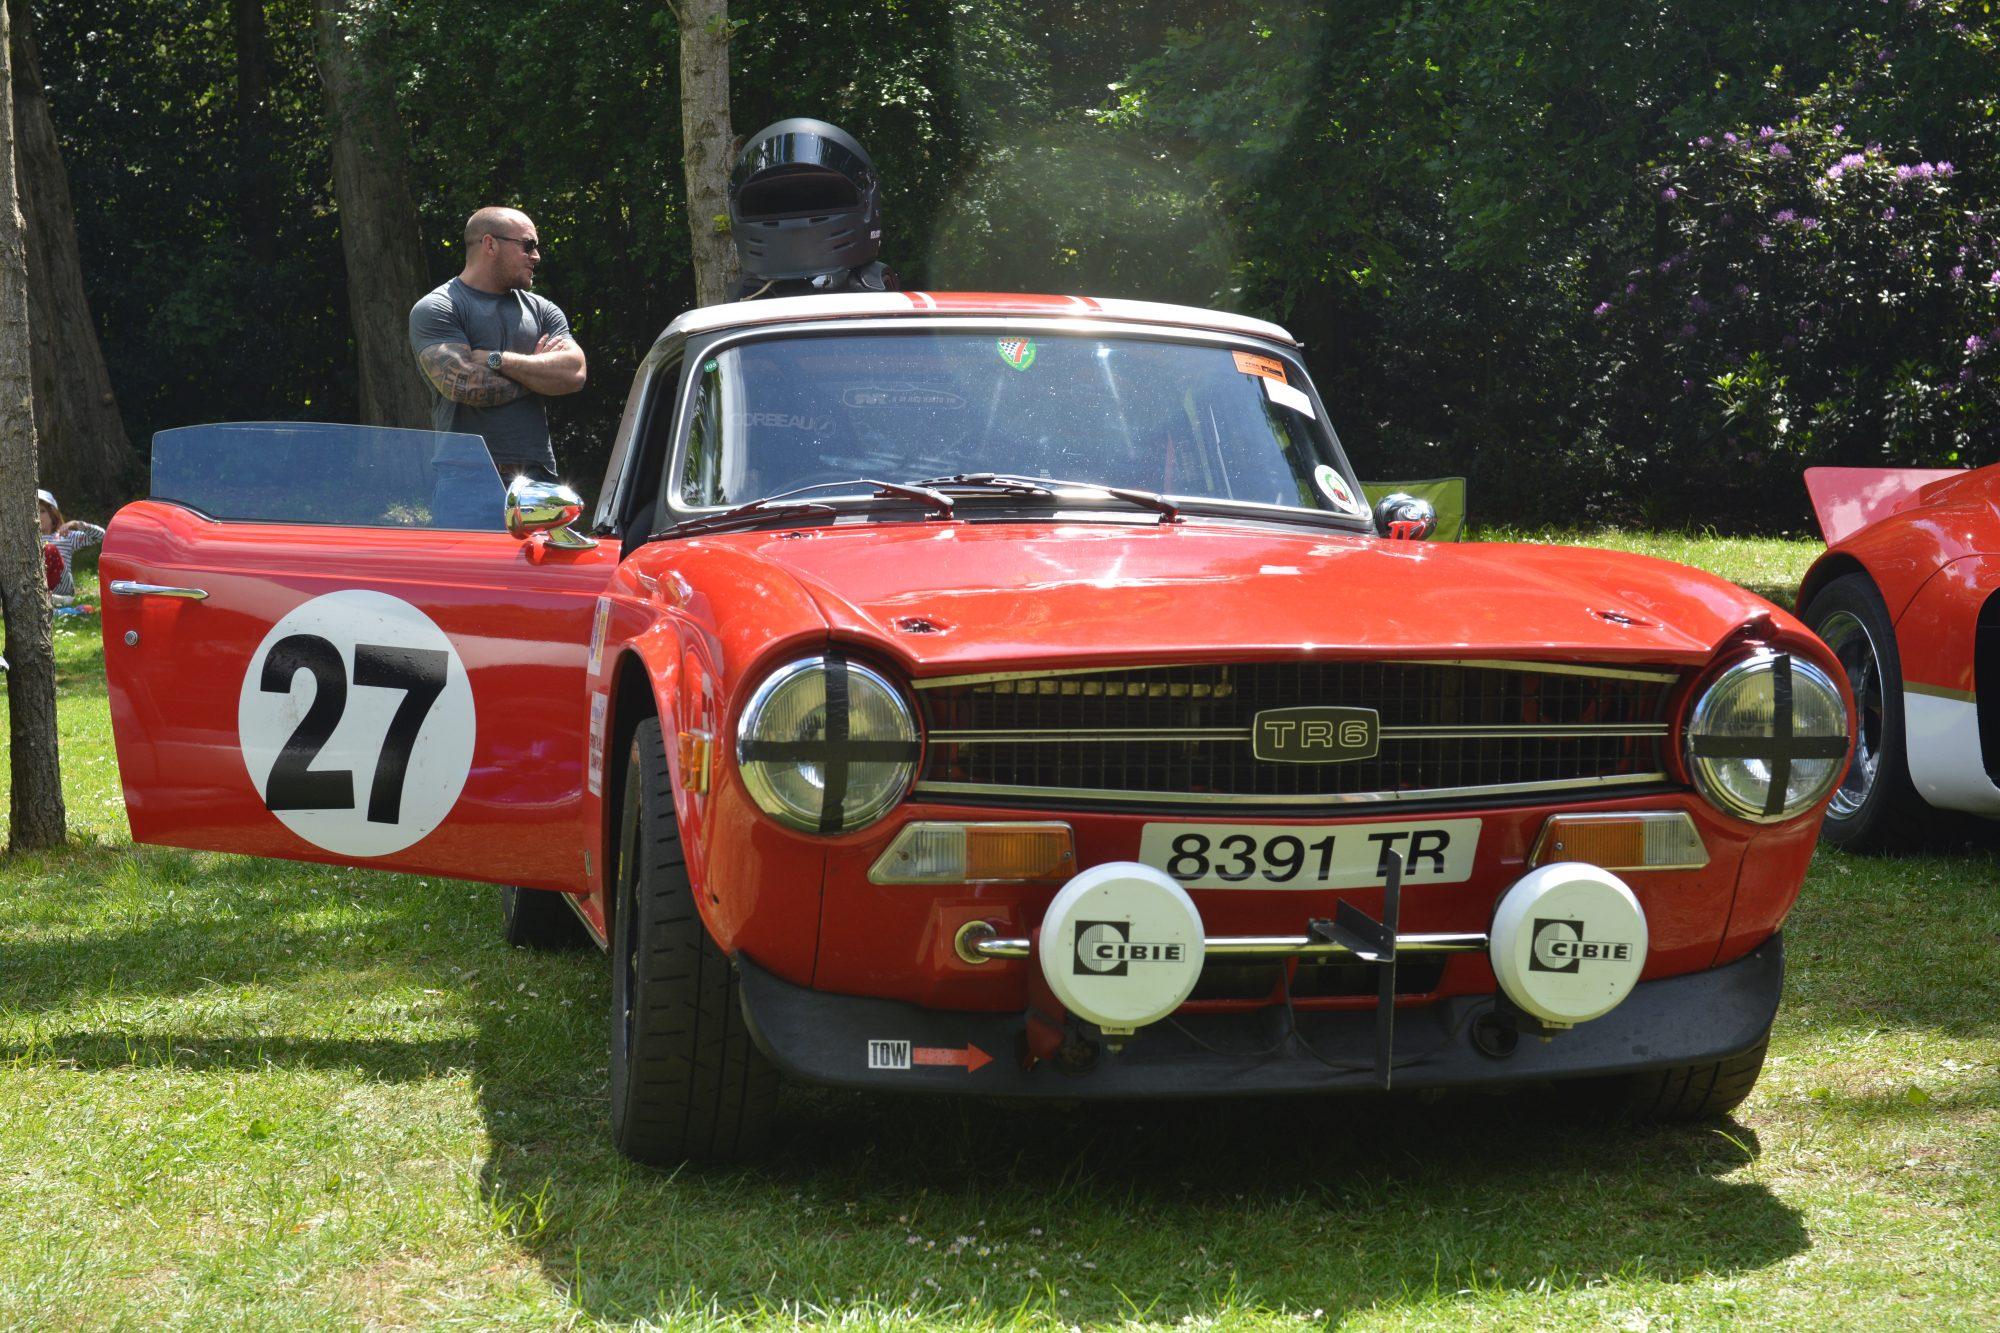 Motorsport, Motorsport at the Palace, Crystal Palace, London car show, classic car, show, classic motorsport, TR6